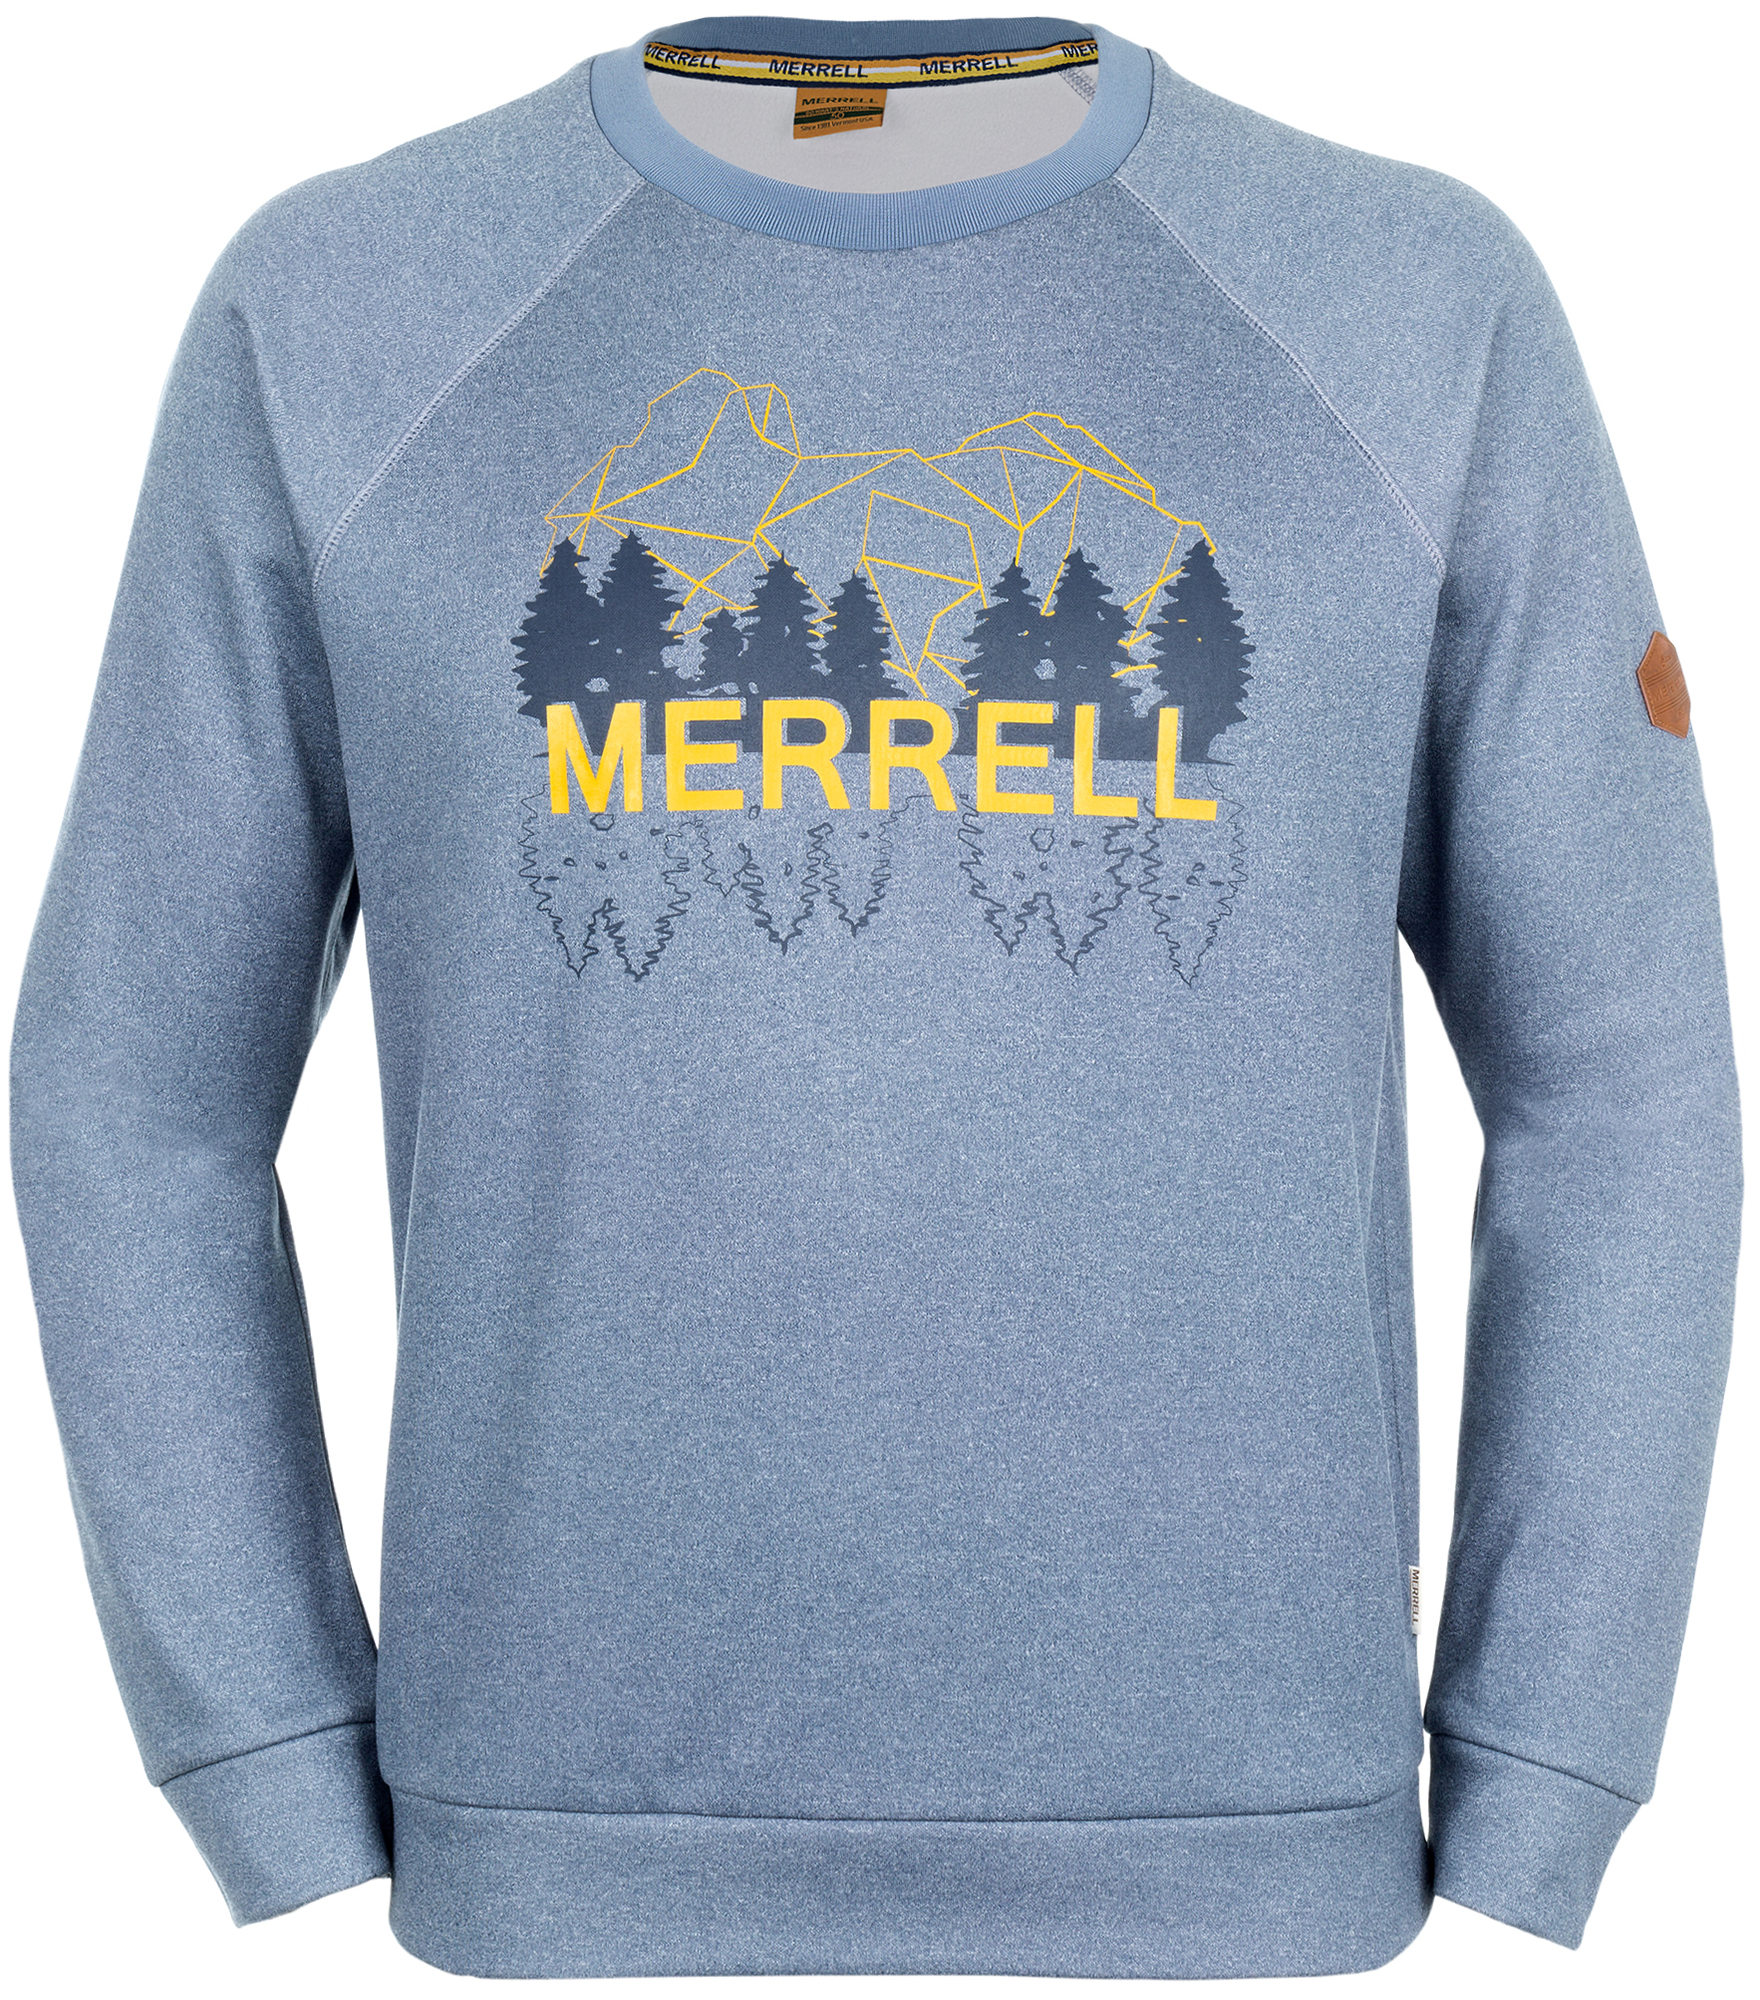 Merrell Футболка с длинным рукавом мужская Merrell Phraaspa ветровка мужская merrell eburacum